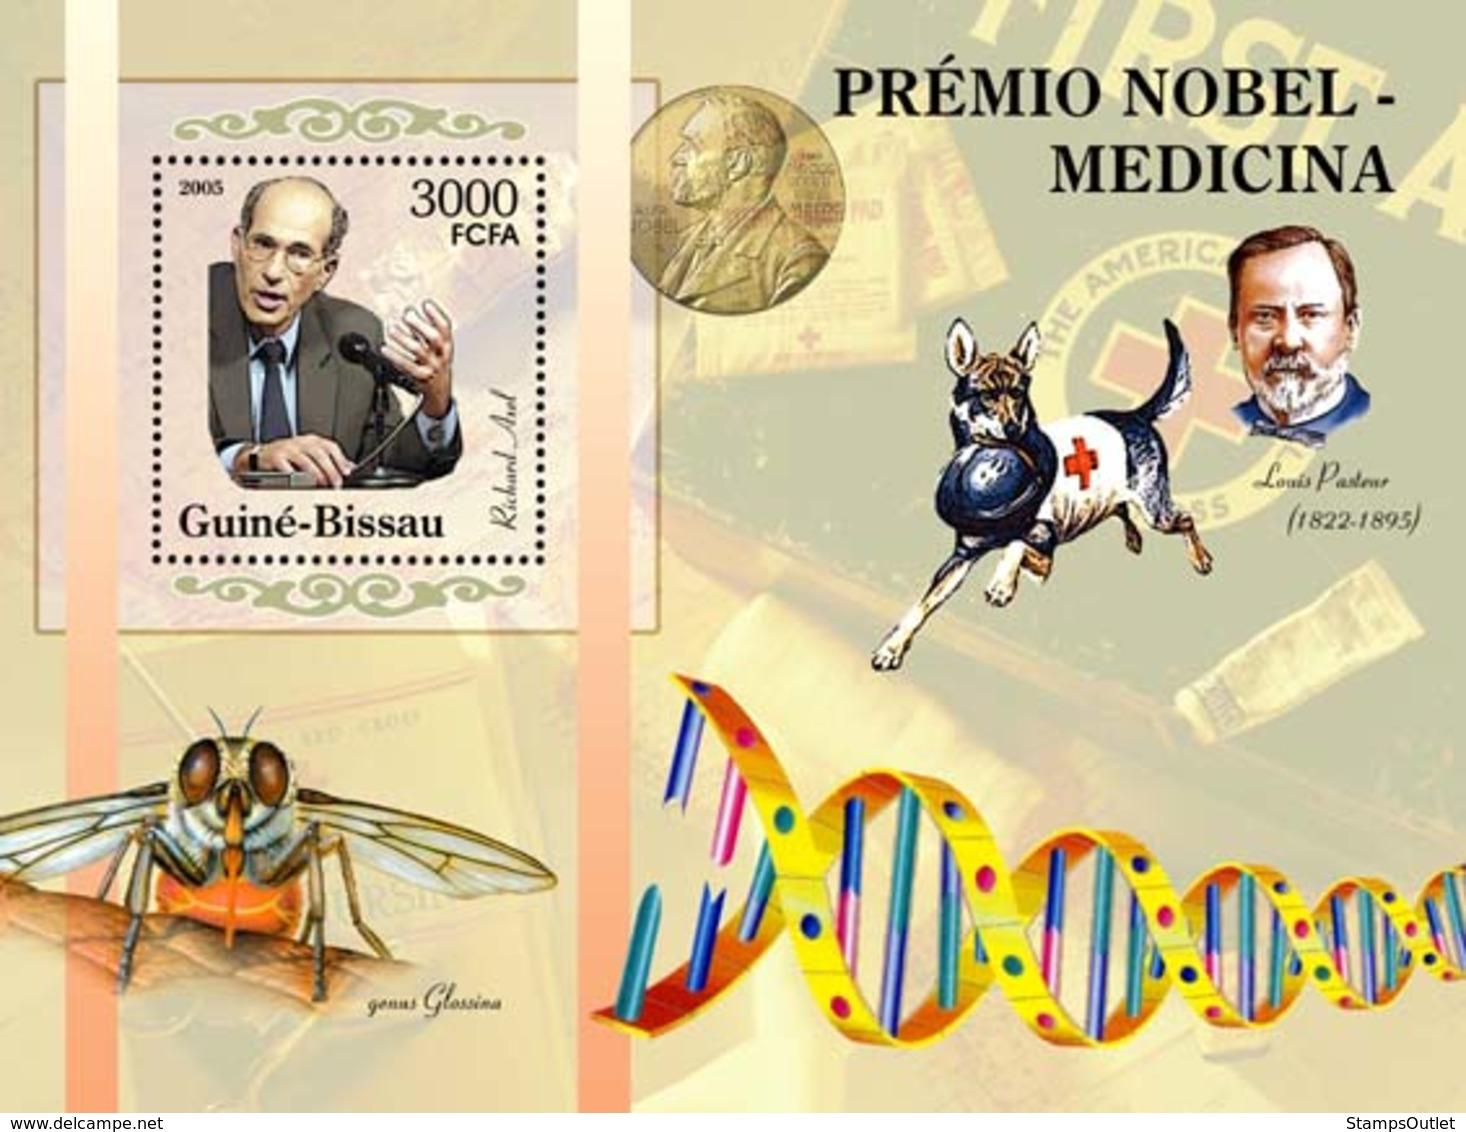 Guinea - Bissau 2005 - Nobel Prize Winners -Medicine-Richard Axel, L.Pasteur, Red Cross S/s, Y&T 275, Michel 3192/BL531 - Guinée-Bissau